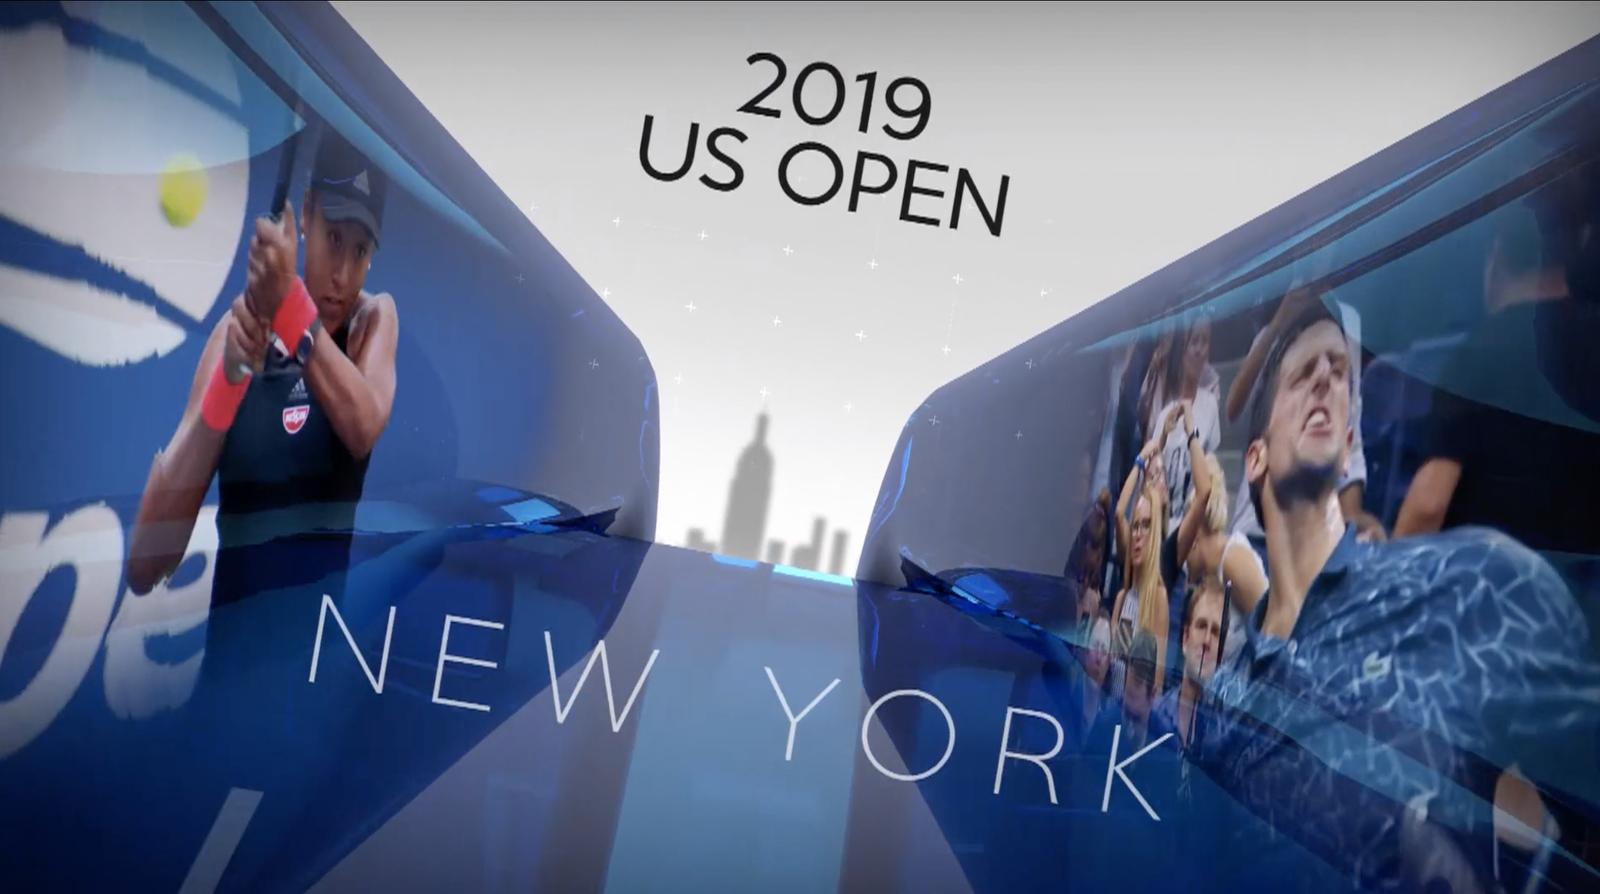 NCS_US-Open_ESPN-Broadcast-Design_006